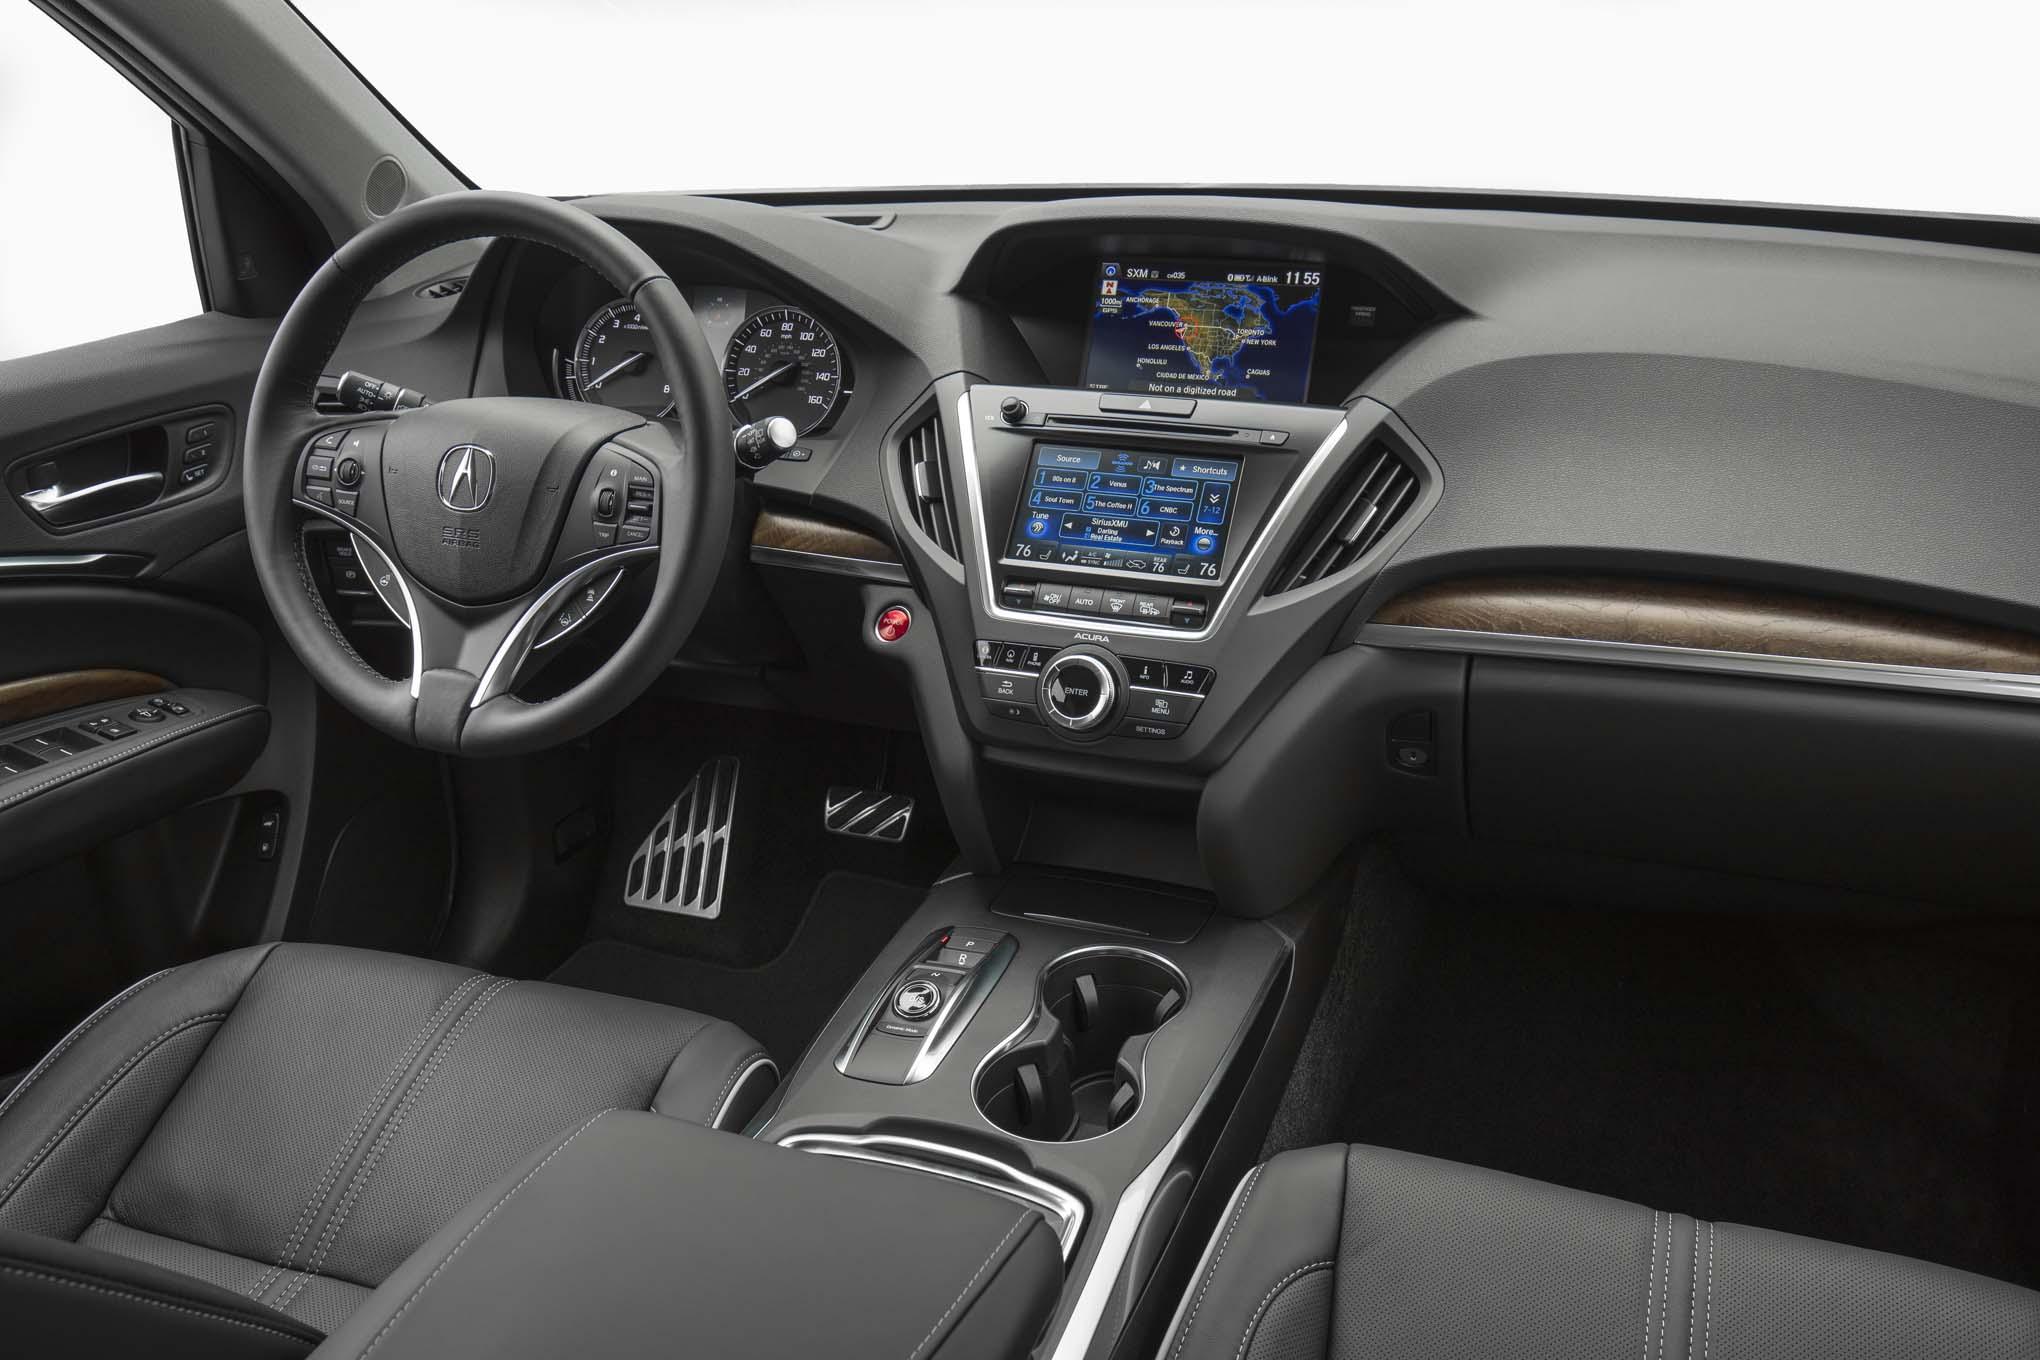 2017 Acura MDX Hybrid Interior View 04. 25 Julio, 2017 Miguel Cortina